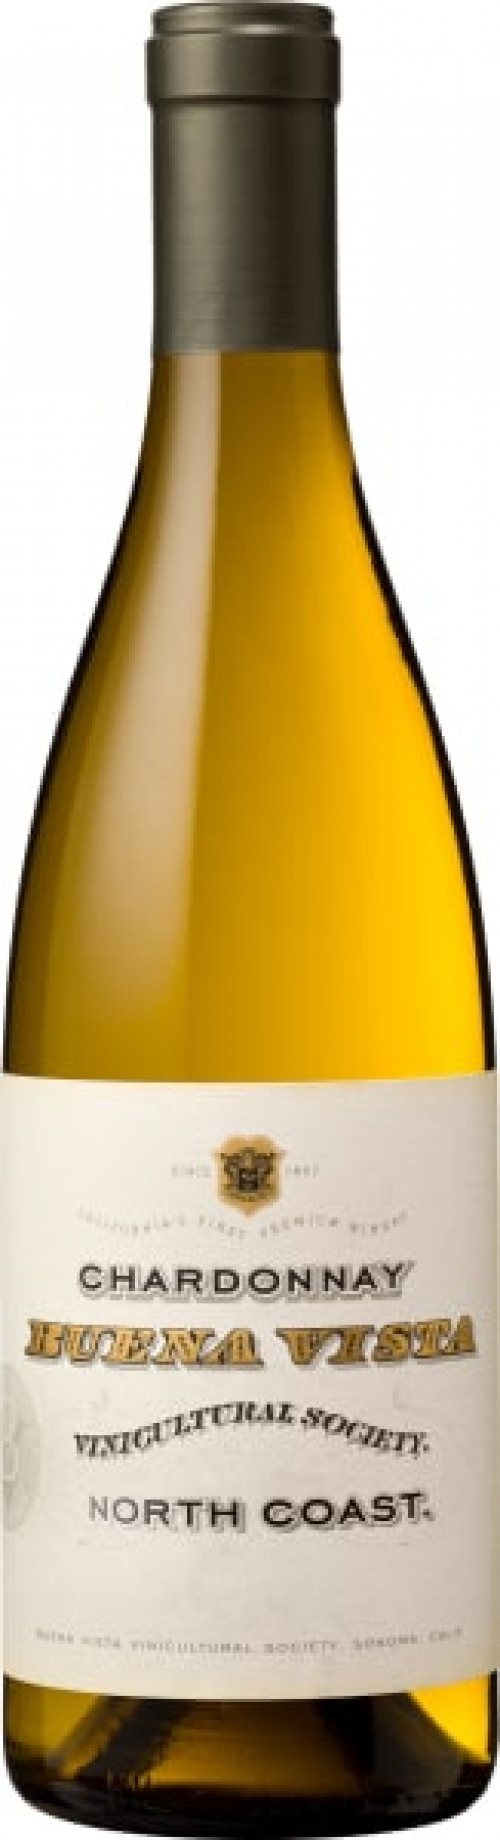 2016 Buena Vista North Coast Chardonnay 750ml